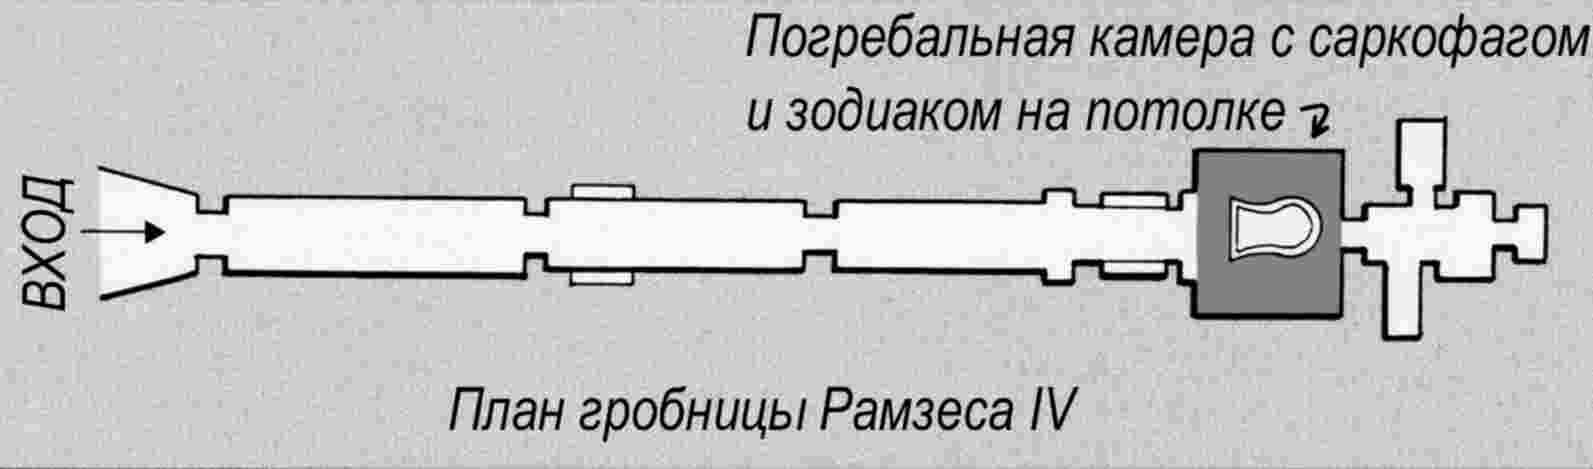 http://sd.uploads.ru/kbzJN.jpg